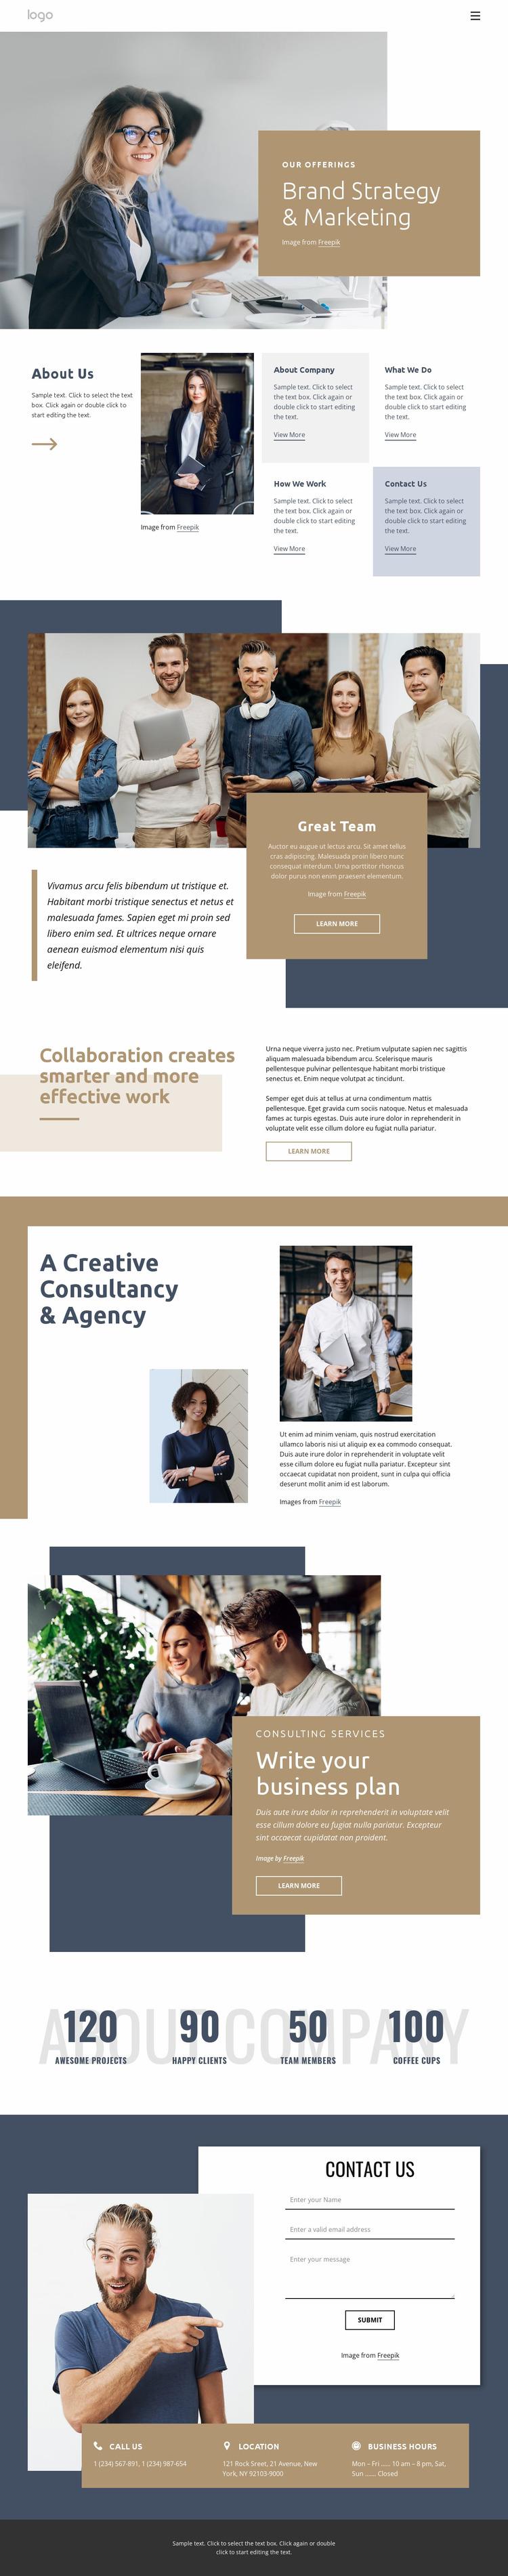 Brand strategy and marketing Website Mockup